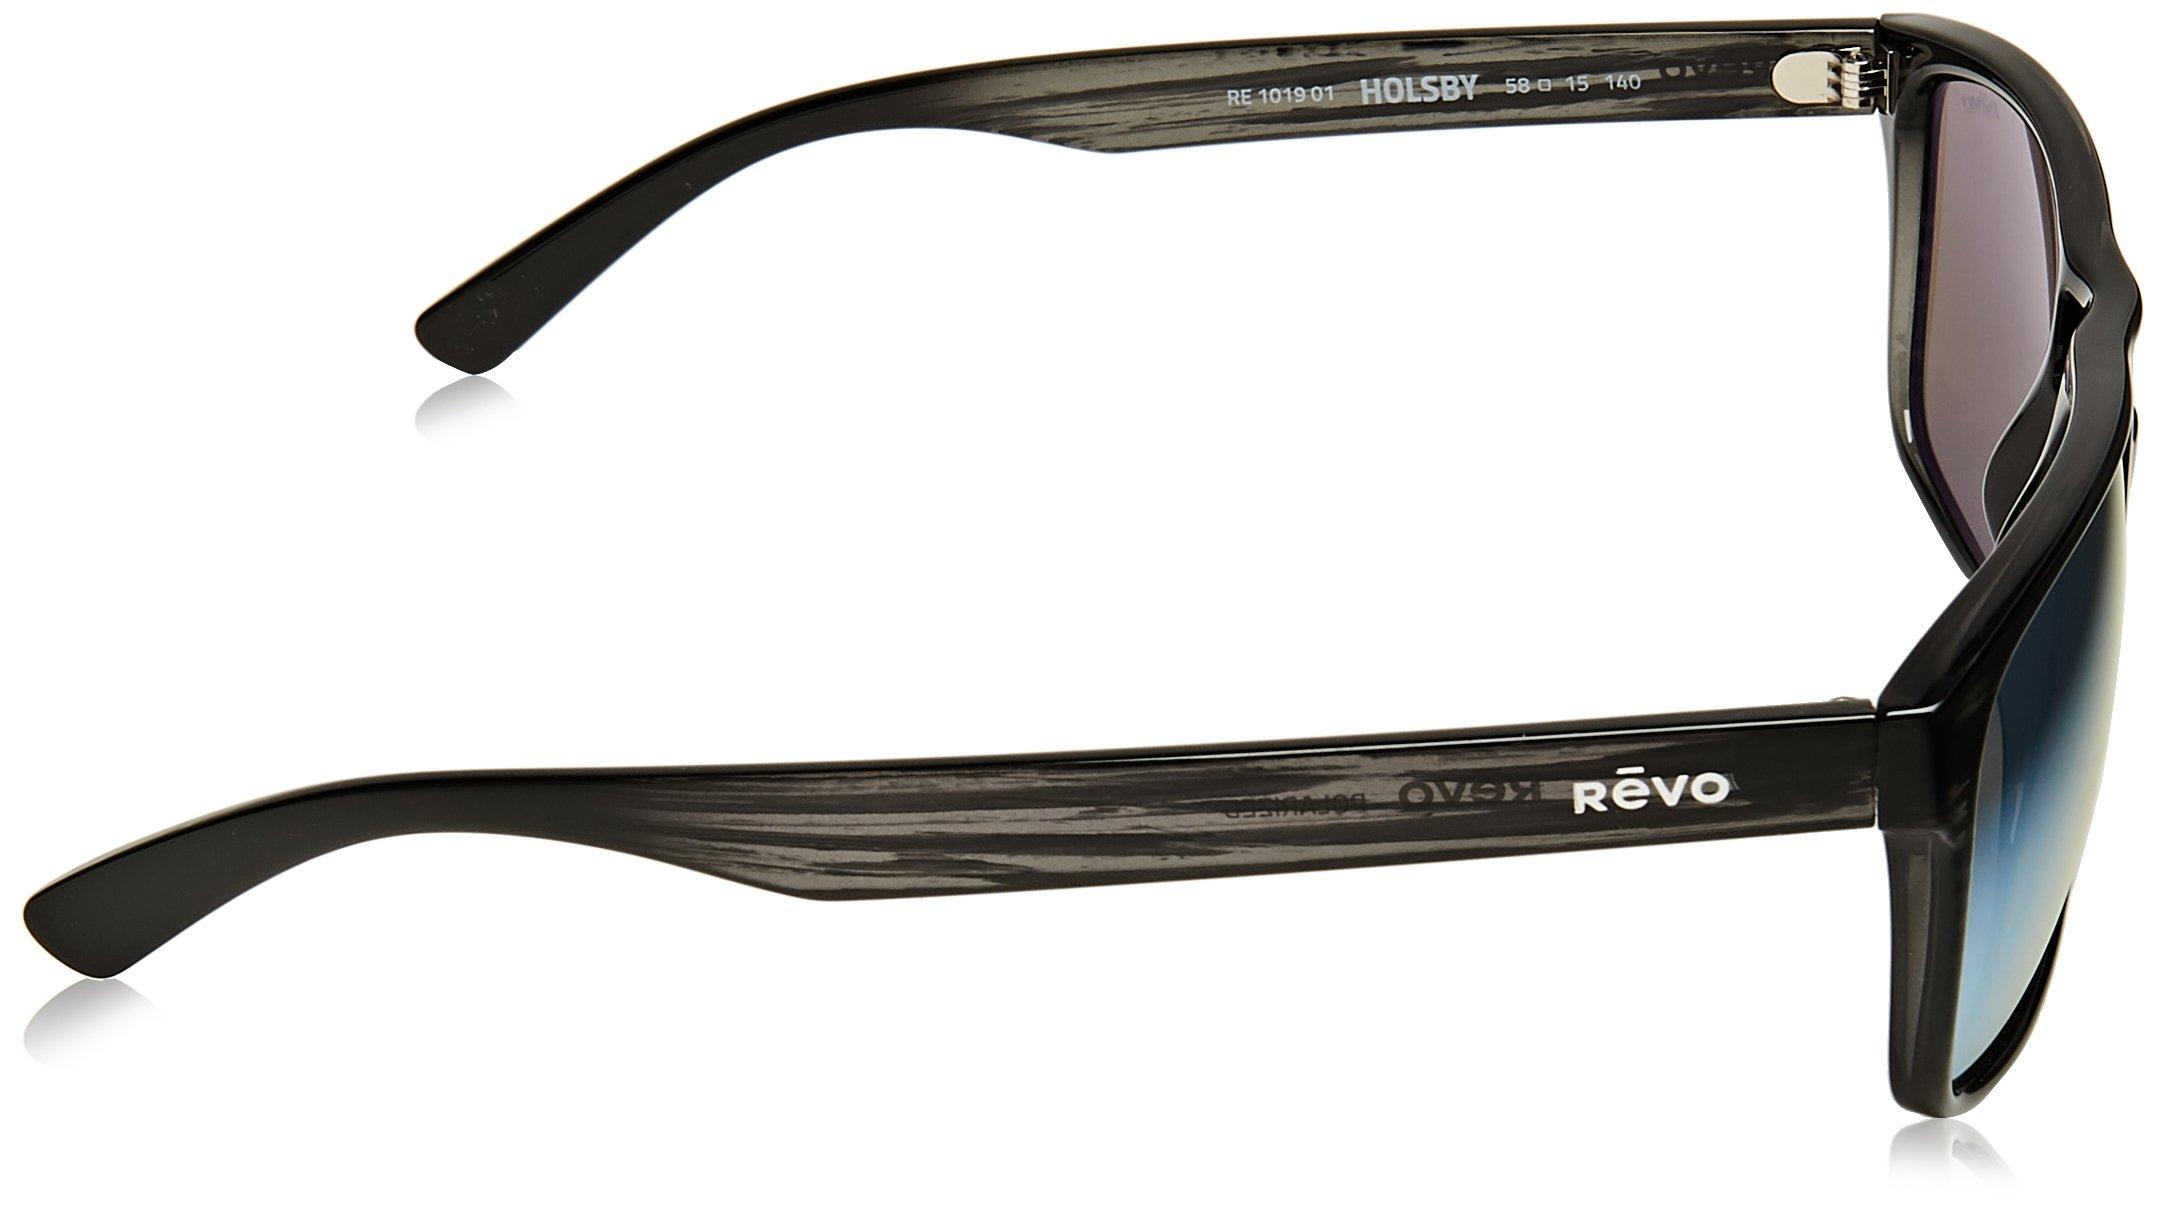 Revo Holsby Style and Performance Polarized Sunglasses, RE1019, Black Woodgrain, 58 mm by Revo Sunglasses (Image #3)